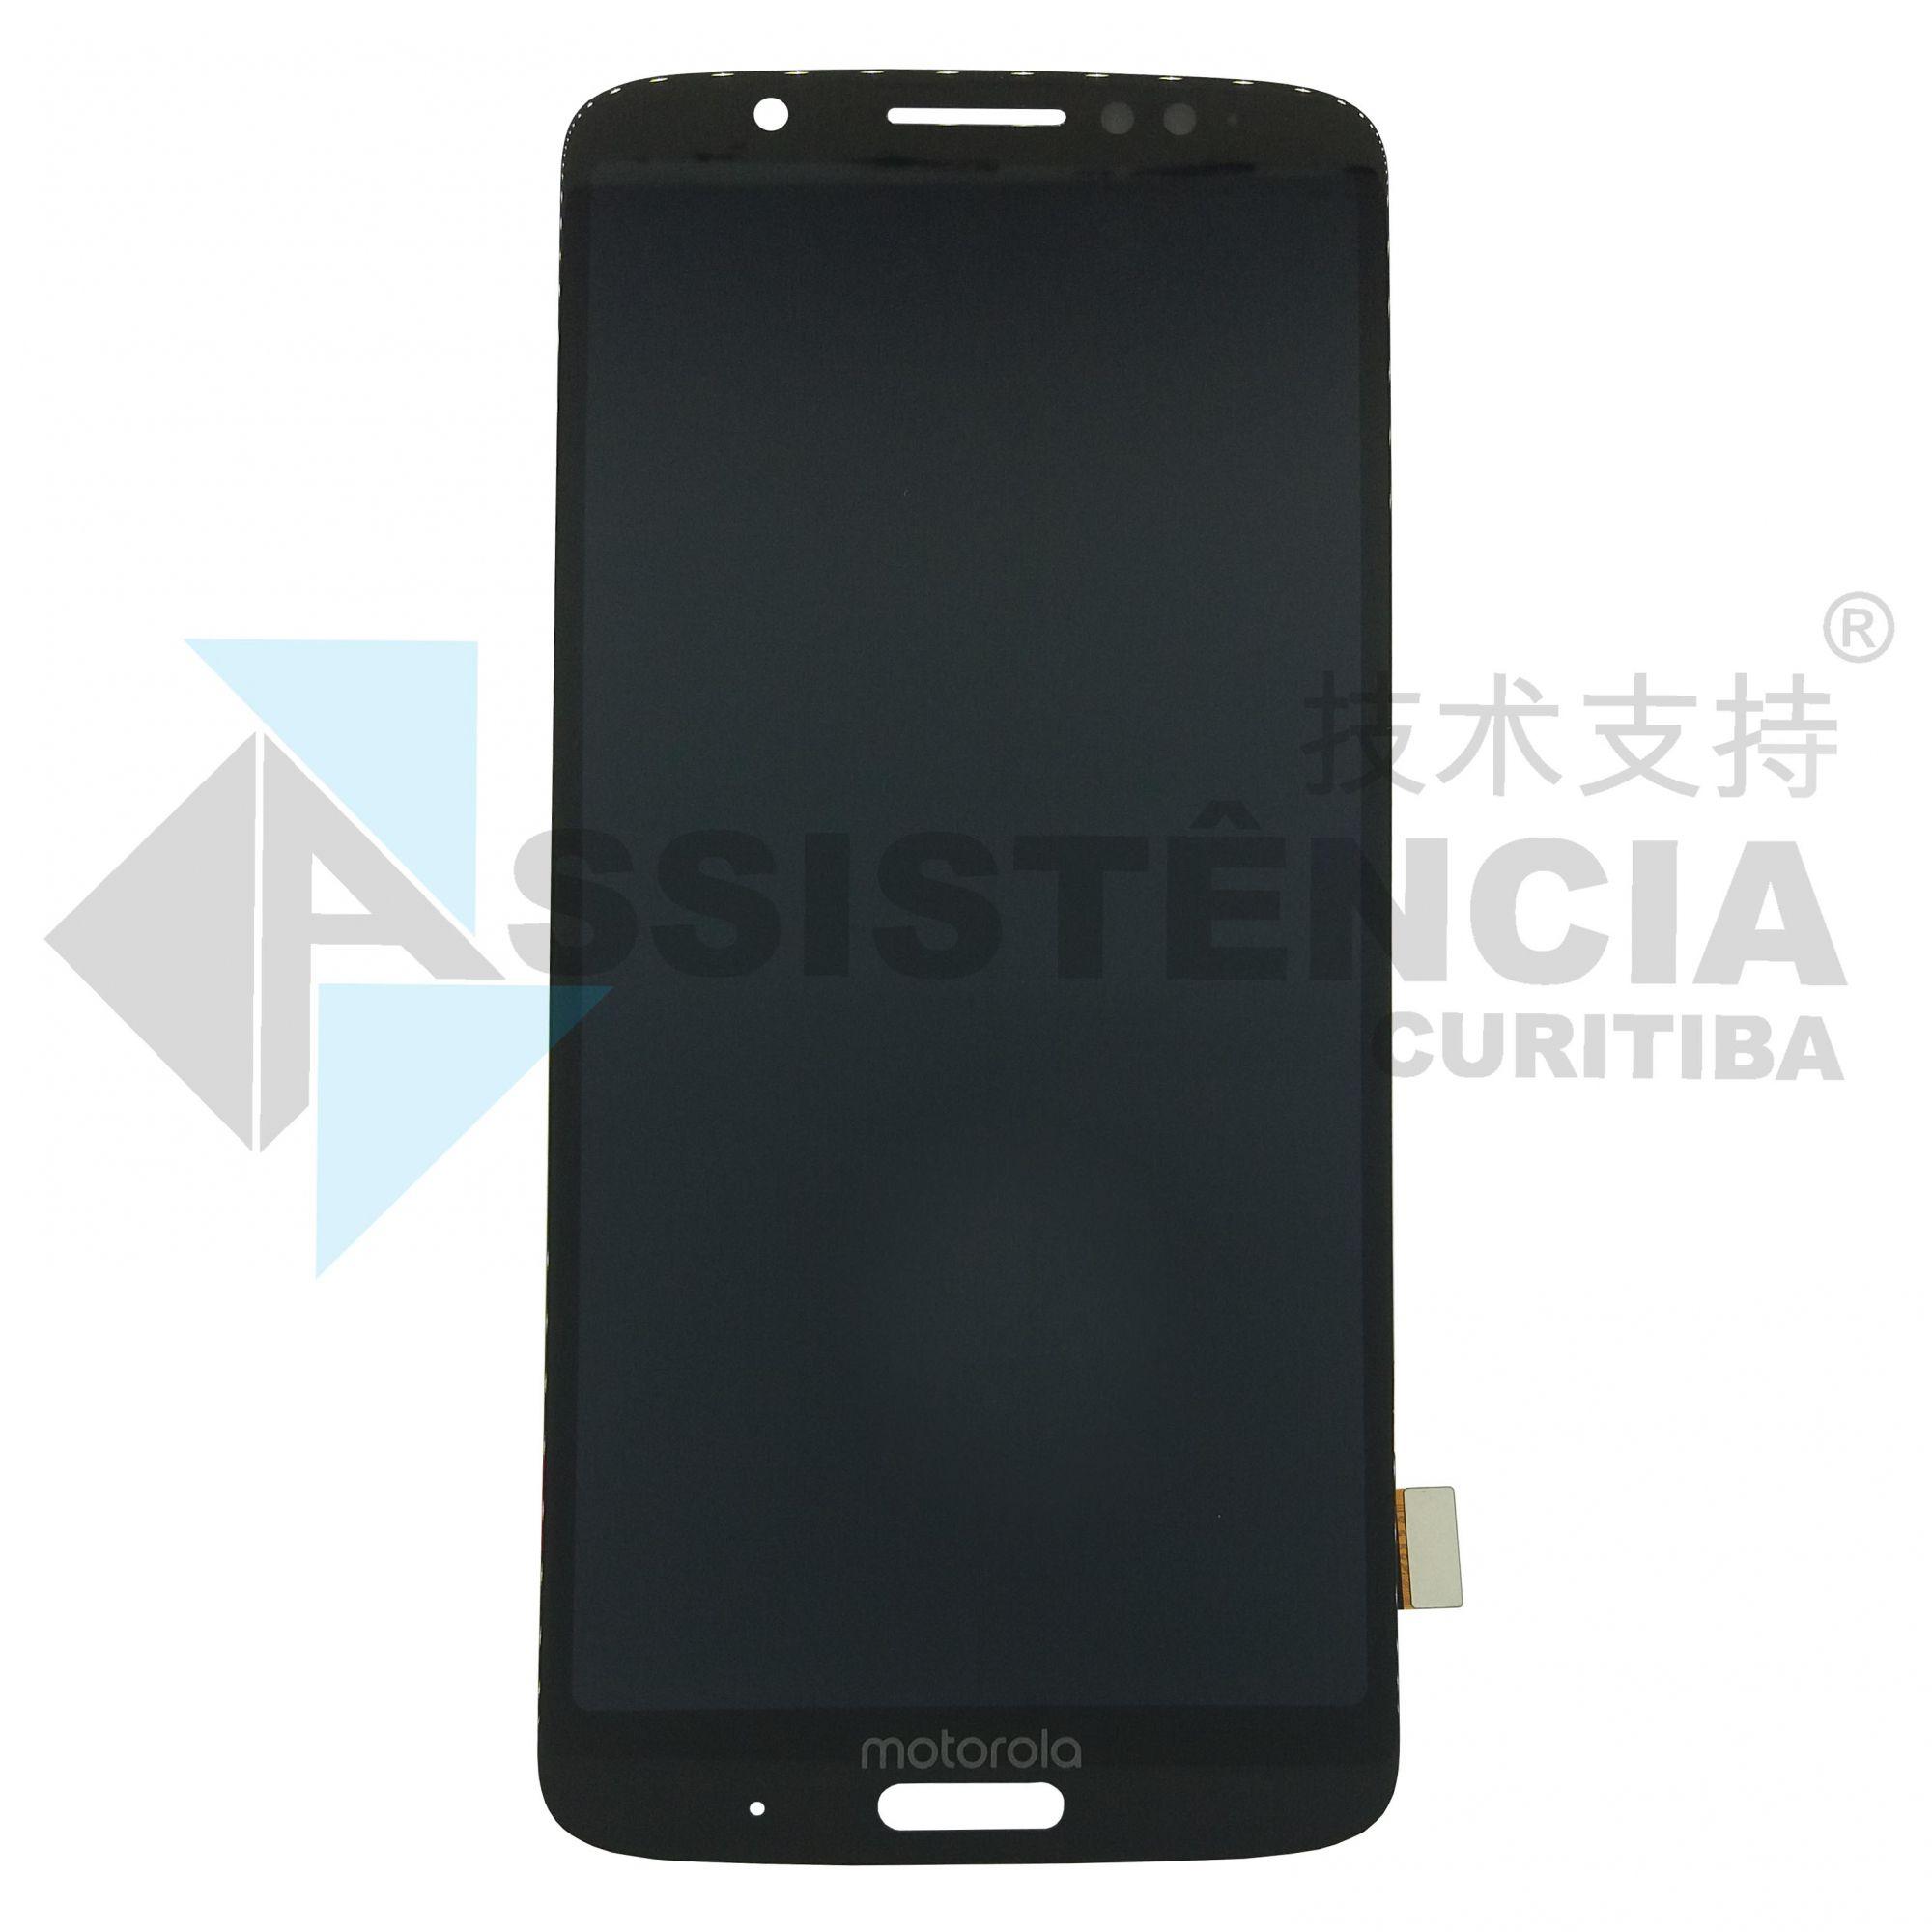 Tela Display Motorola Moto G6 Plus Xt1926 Preto